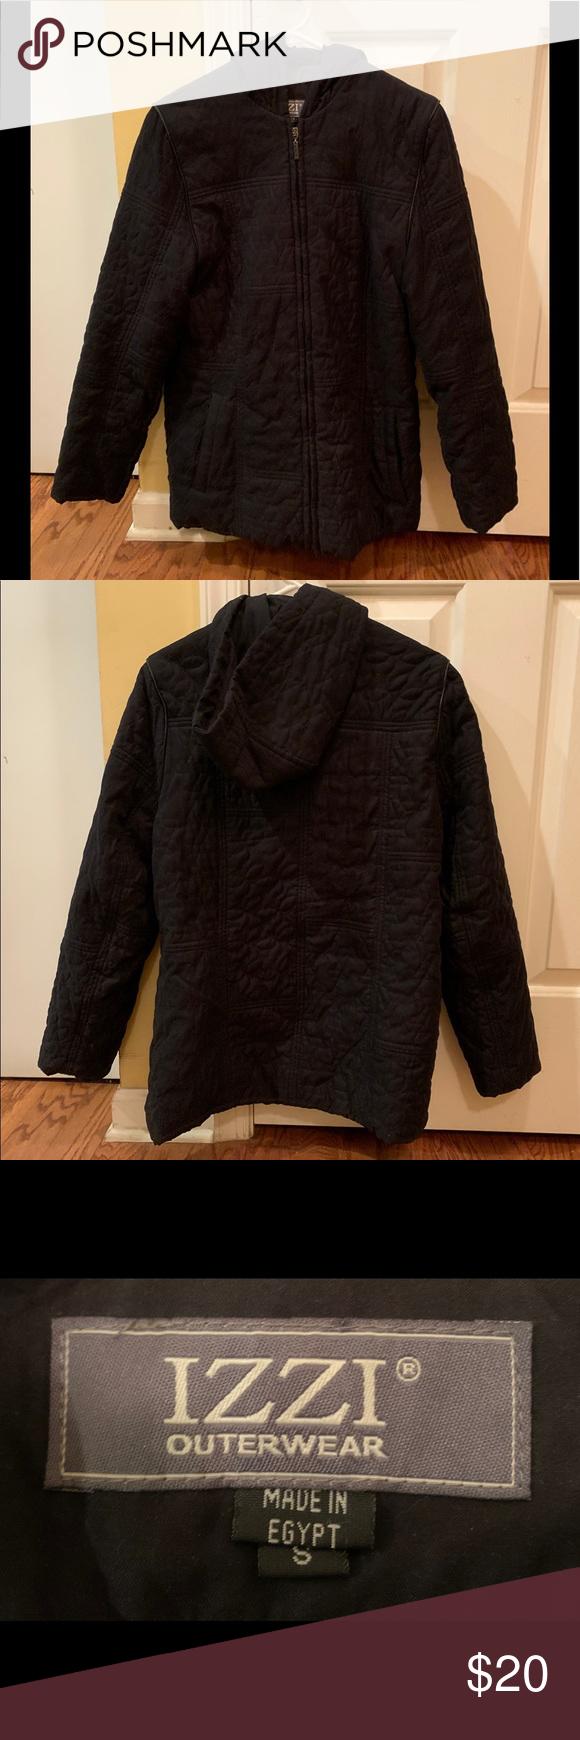 Black Izzi Outerwear Coat Small Womens Black Winter Coat Izzi Outerwear Made In Egypt Size S Black Winter Coats Women Outerwear Black Winter Coat [ 1740 x 580 Pixel ]